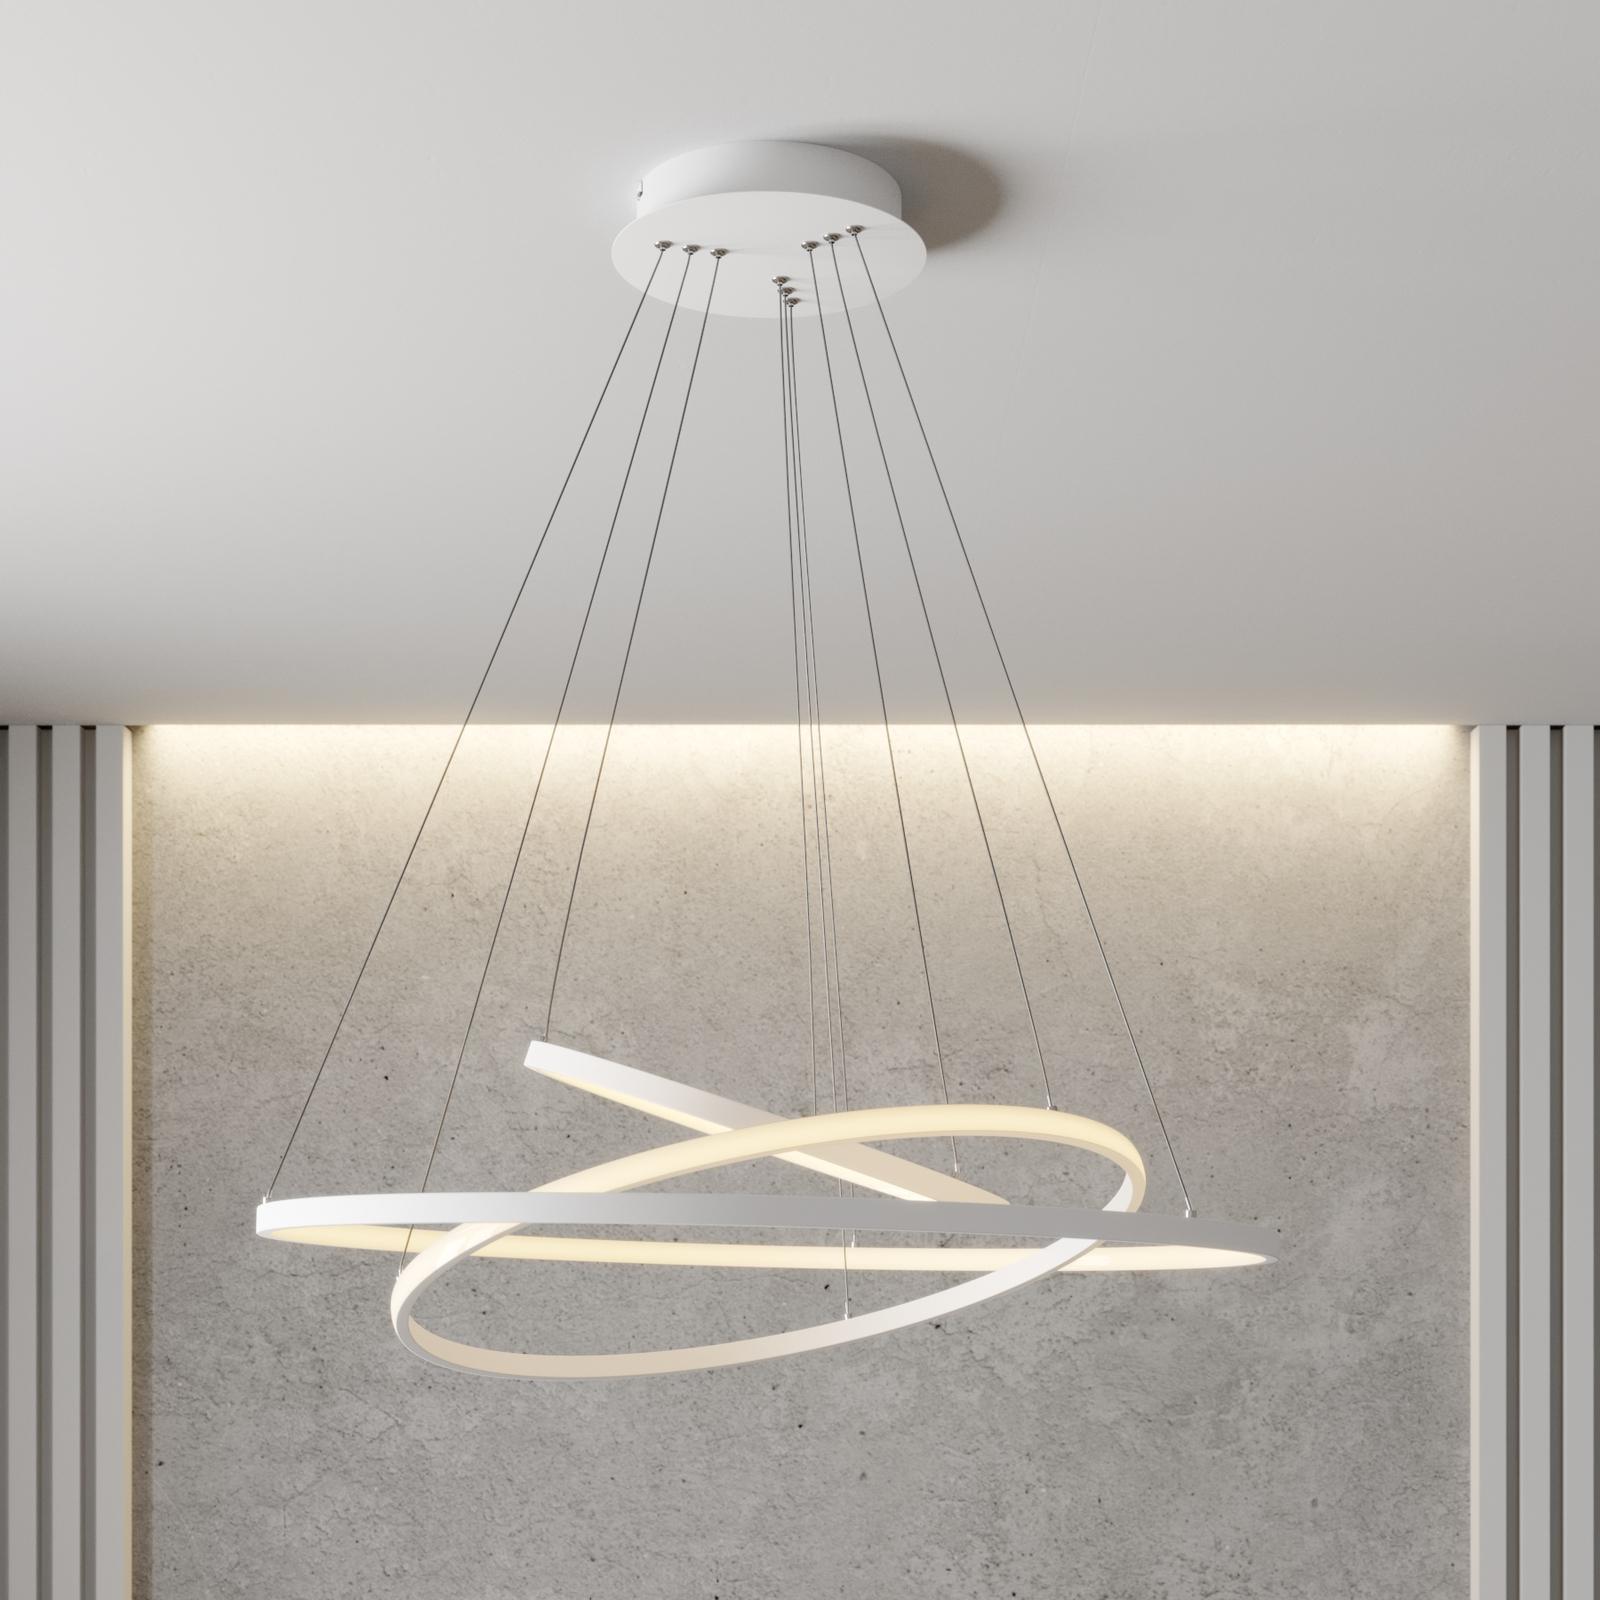 LED-pendellampa Ezana av tre ringar, vit